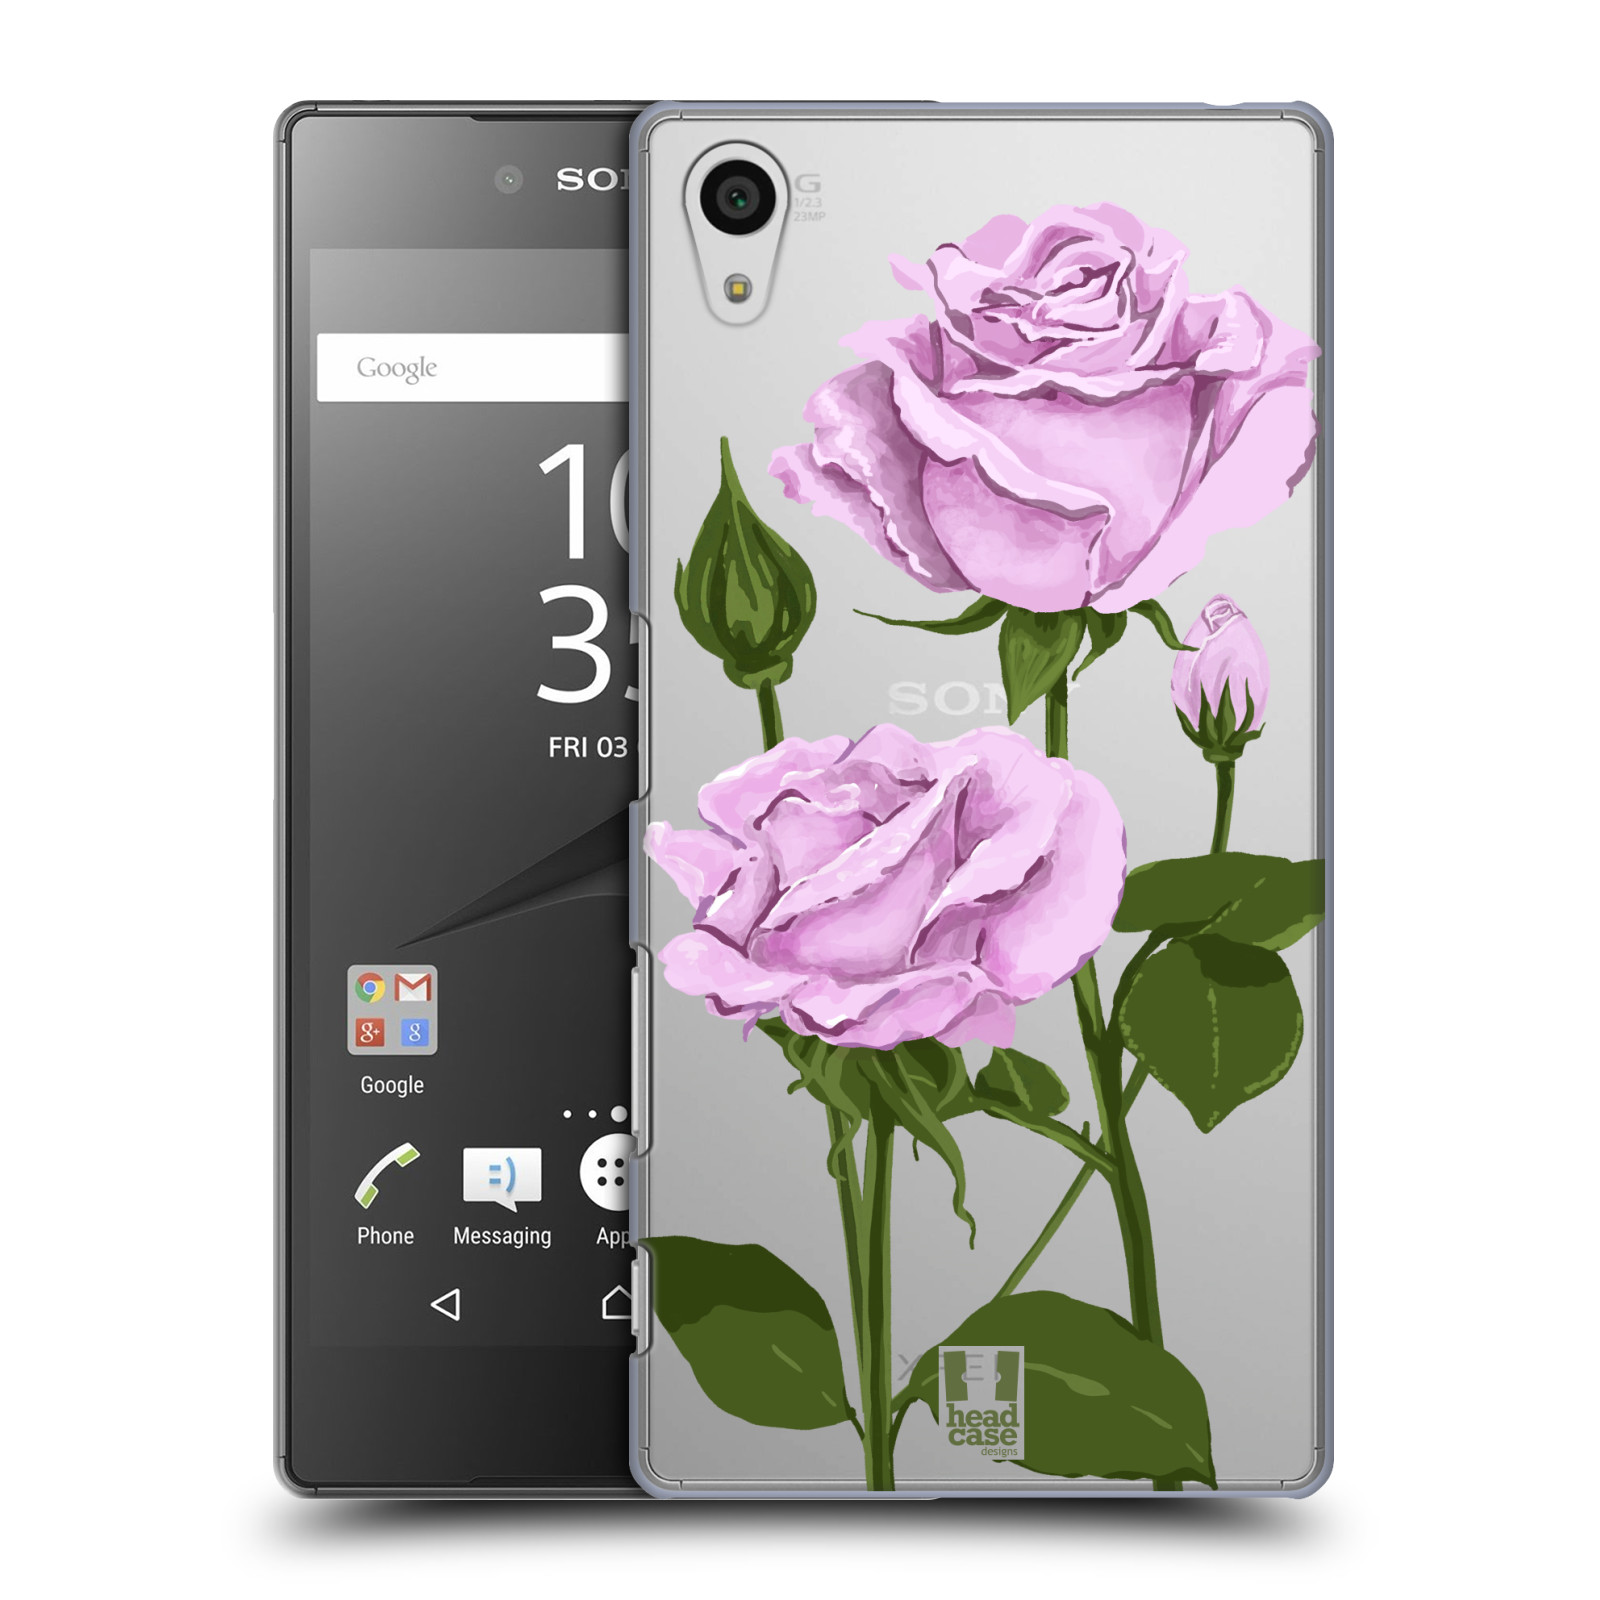 Pouzdro na mobil Sony Xperia Z5 - HEAD CASE - květina růže růžová